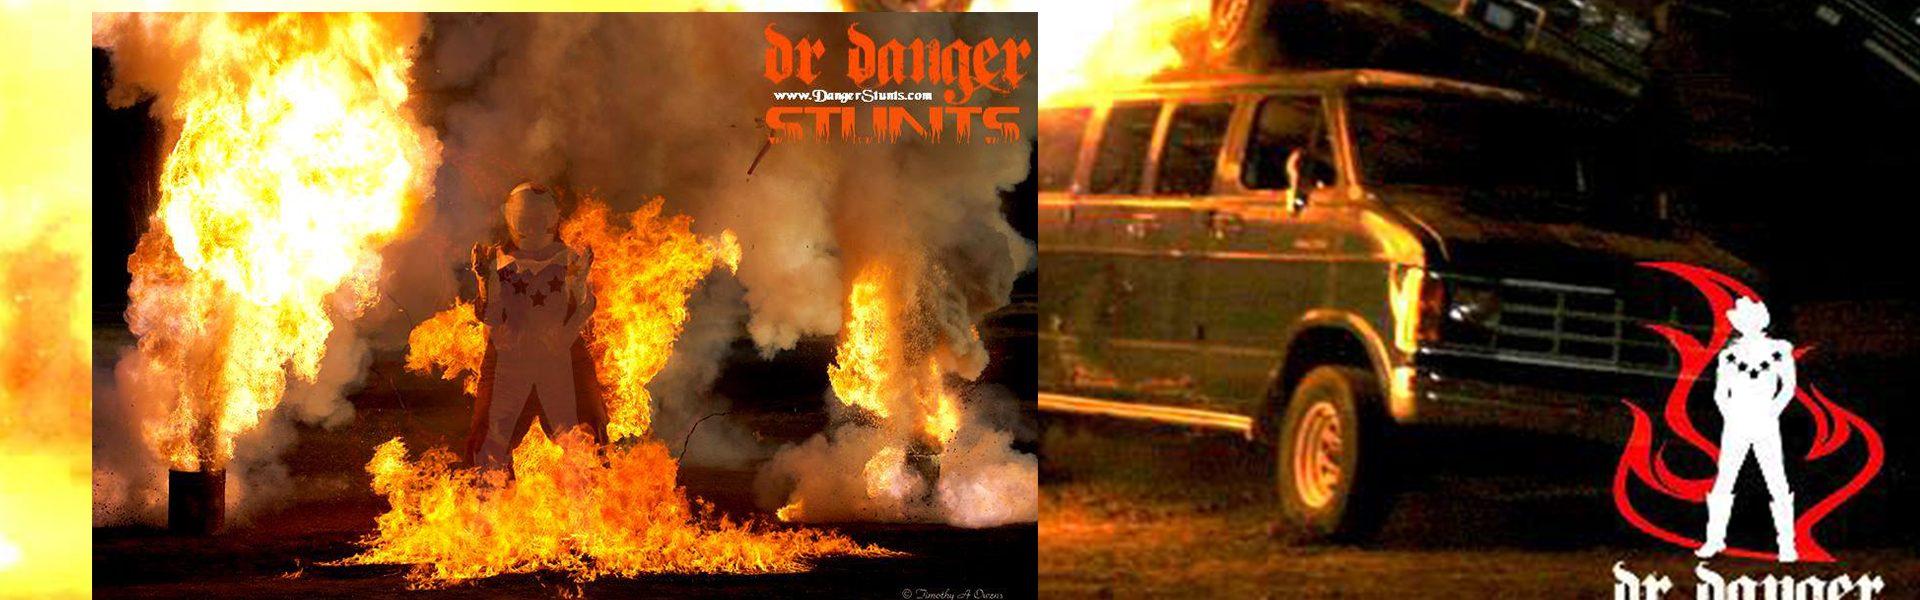 Dr. Danger